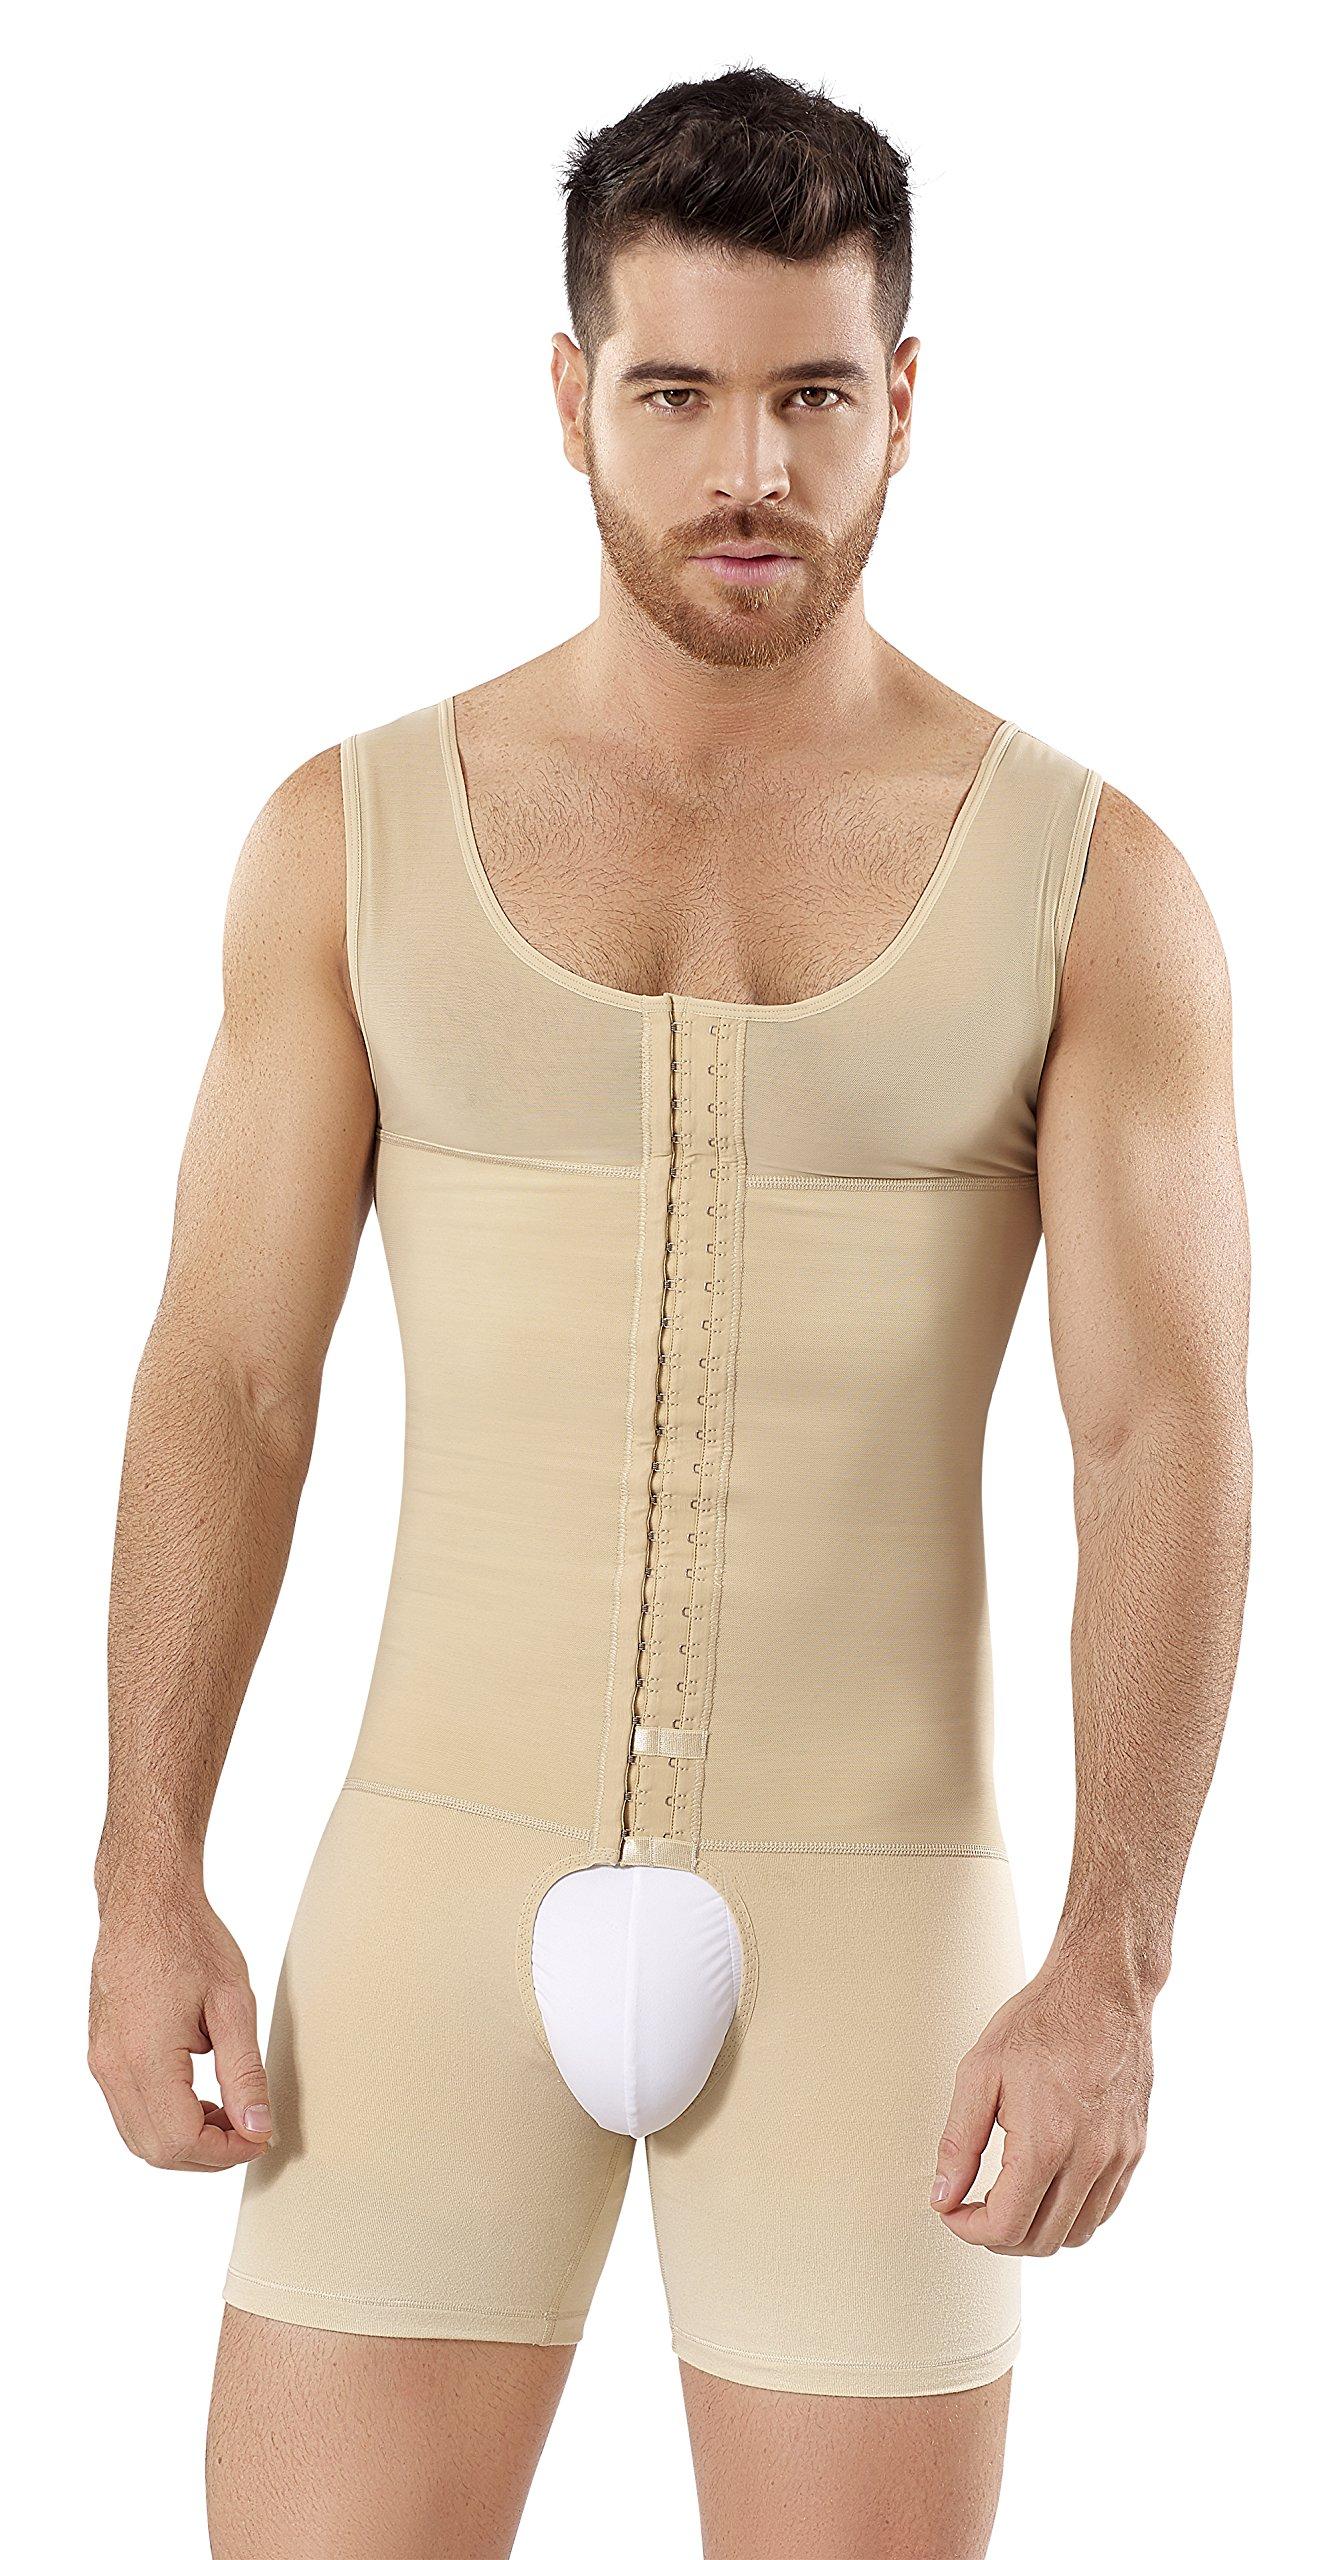 Fajas Colombianas Para Hombres Mens Girdle High Compression Garmen Shapewear Bodysuit Faja Body Shaper for Men SCH0061 (Beige, Medium)